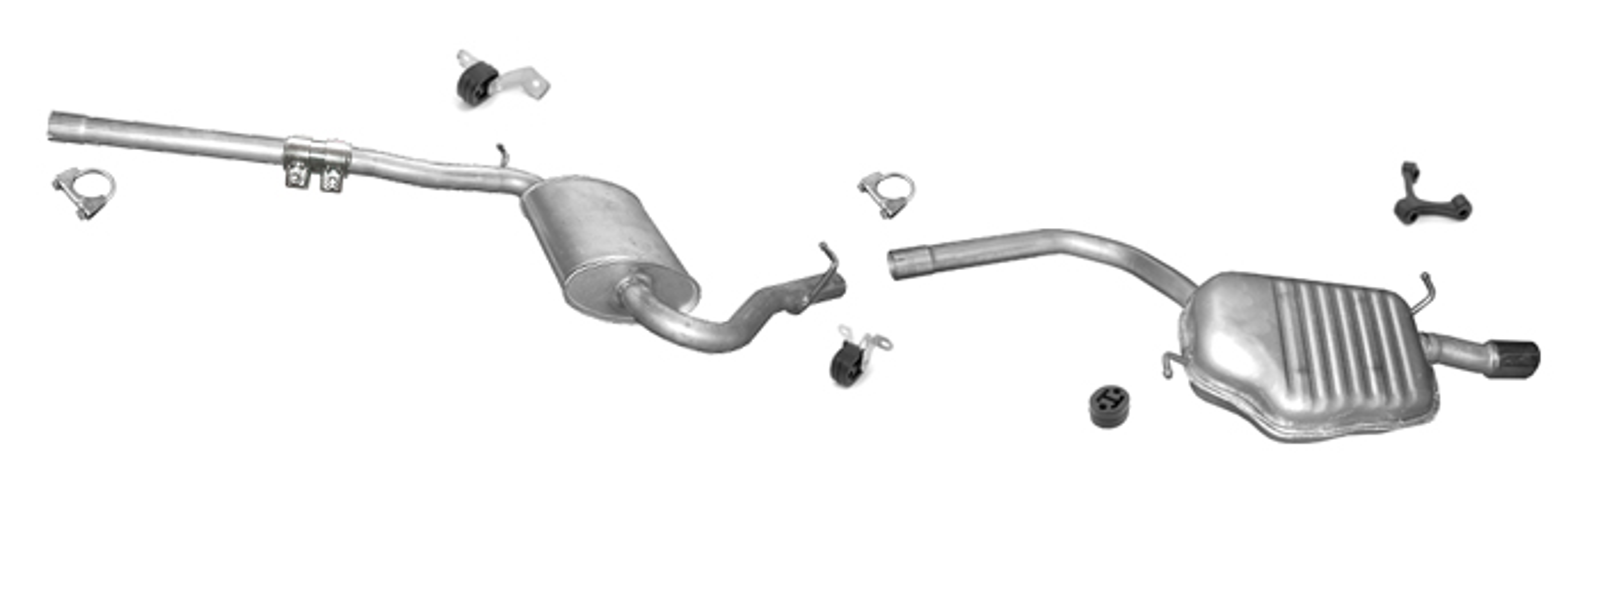 Auspuff AUDI A4 (B6 B7) 2.0 96KW 130PS Stufenheck / Kombi